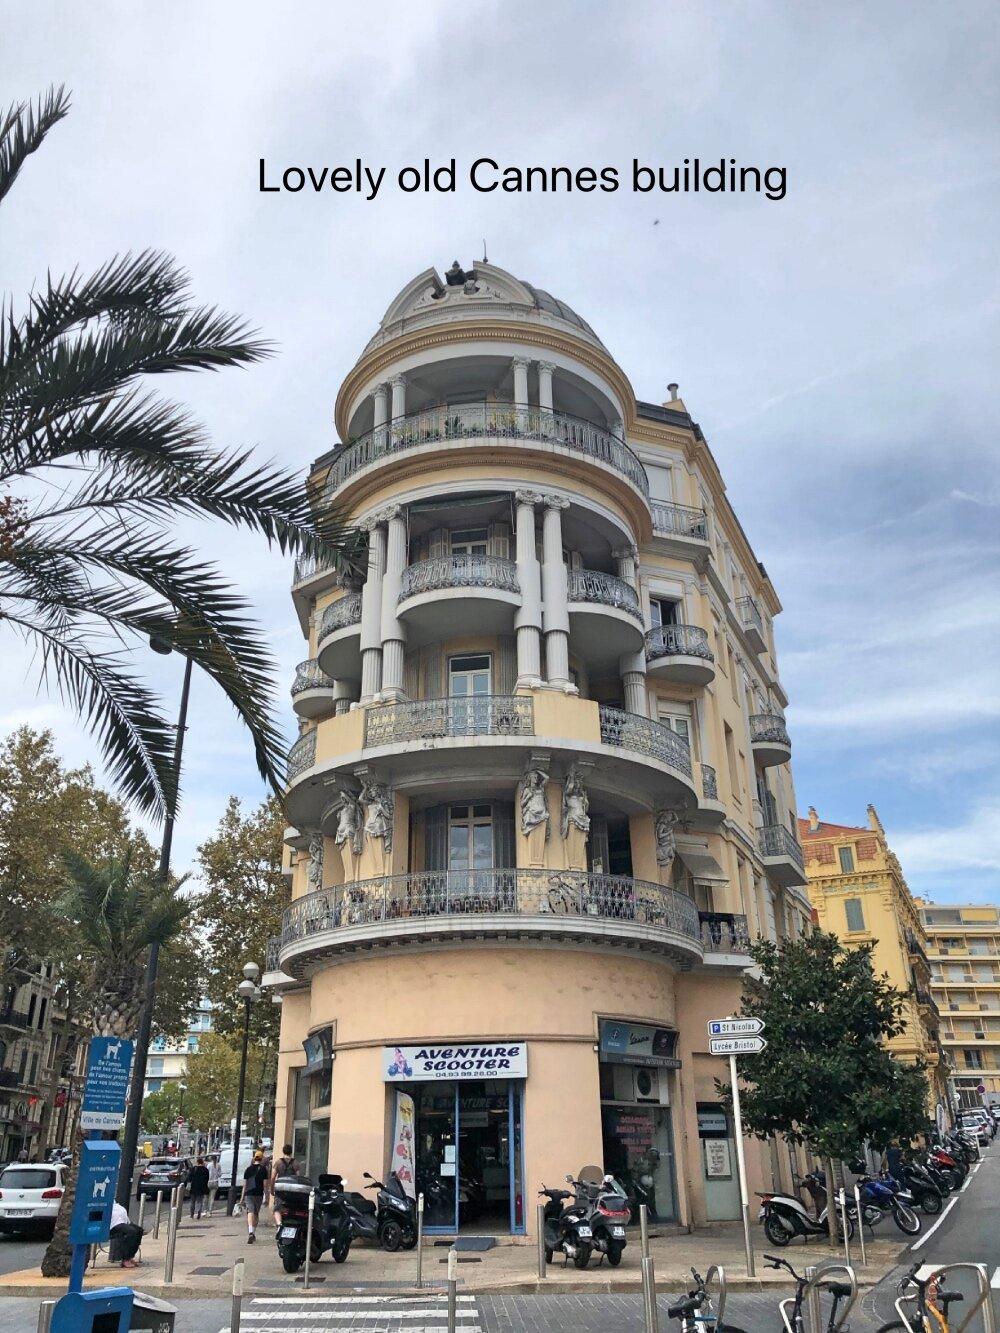 Cannes building.jpg